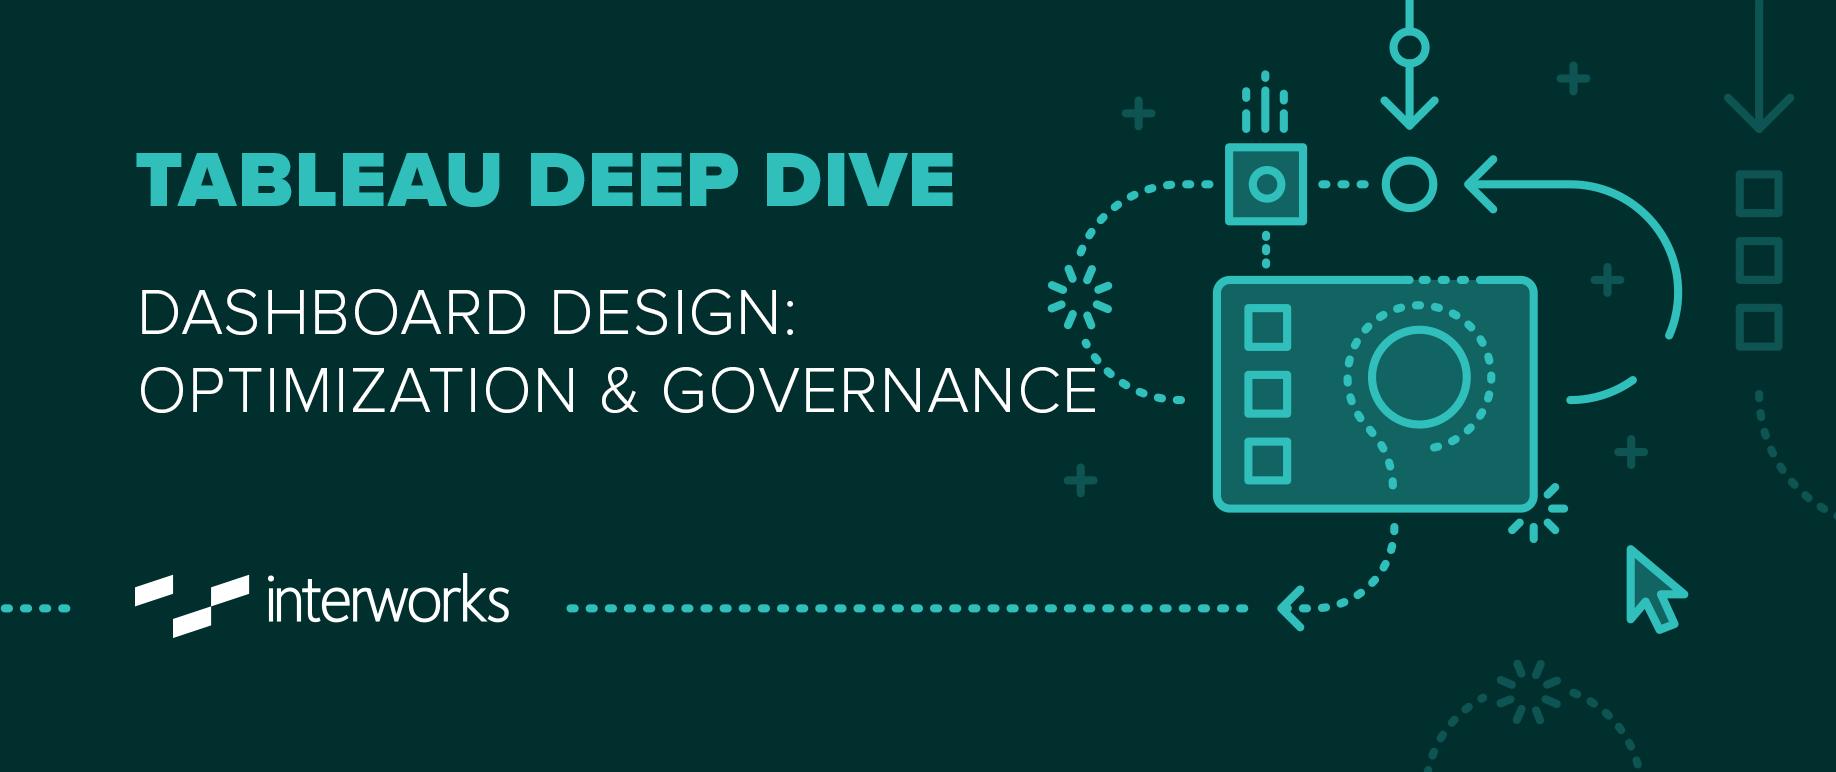 Tableau Deep Dive: Dashboard Design - Optimization